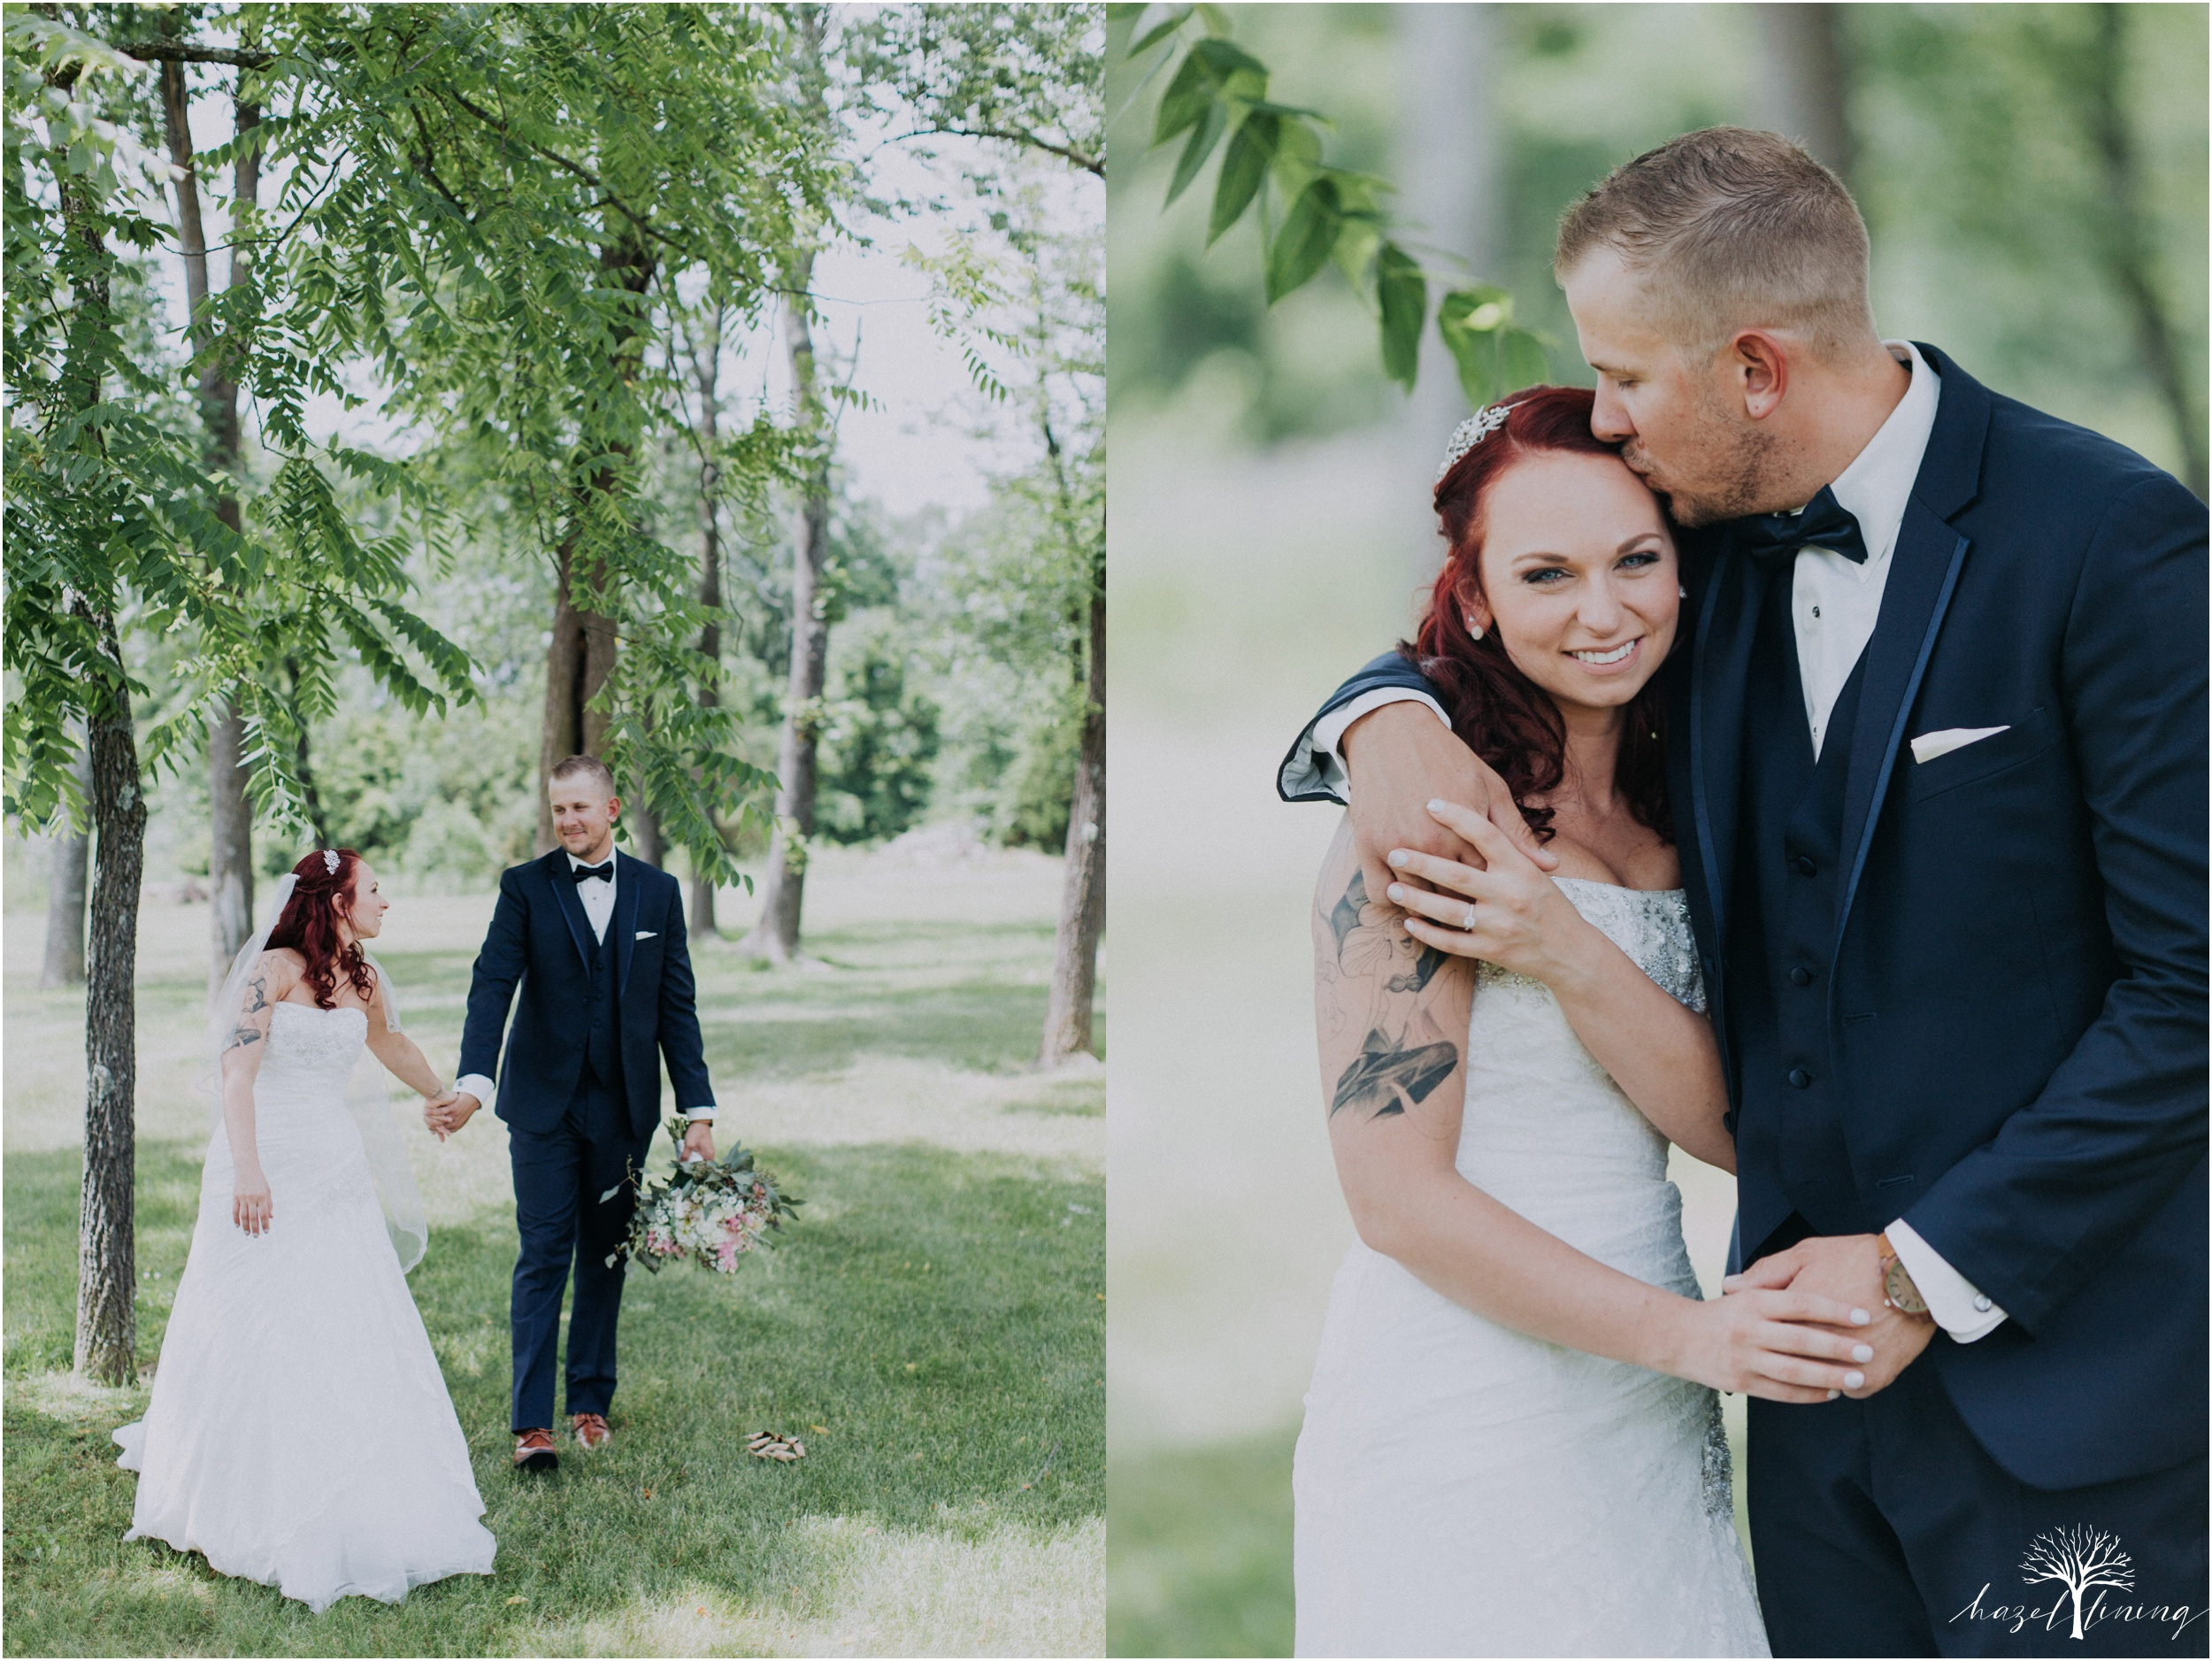 alyssa-james-stiteler-wedding-loft-and-sweet-water-cc-pennsburg-pennsylvania-hazel-lining-travel-wedding-elopement-photography_0045.jpg